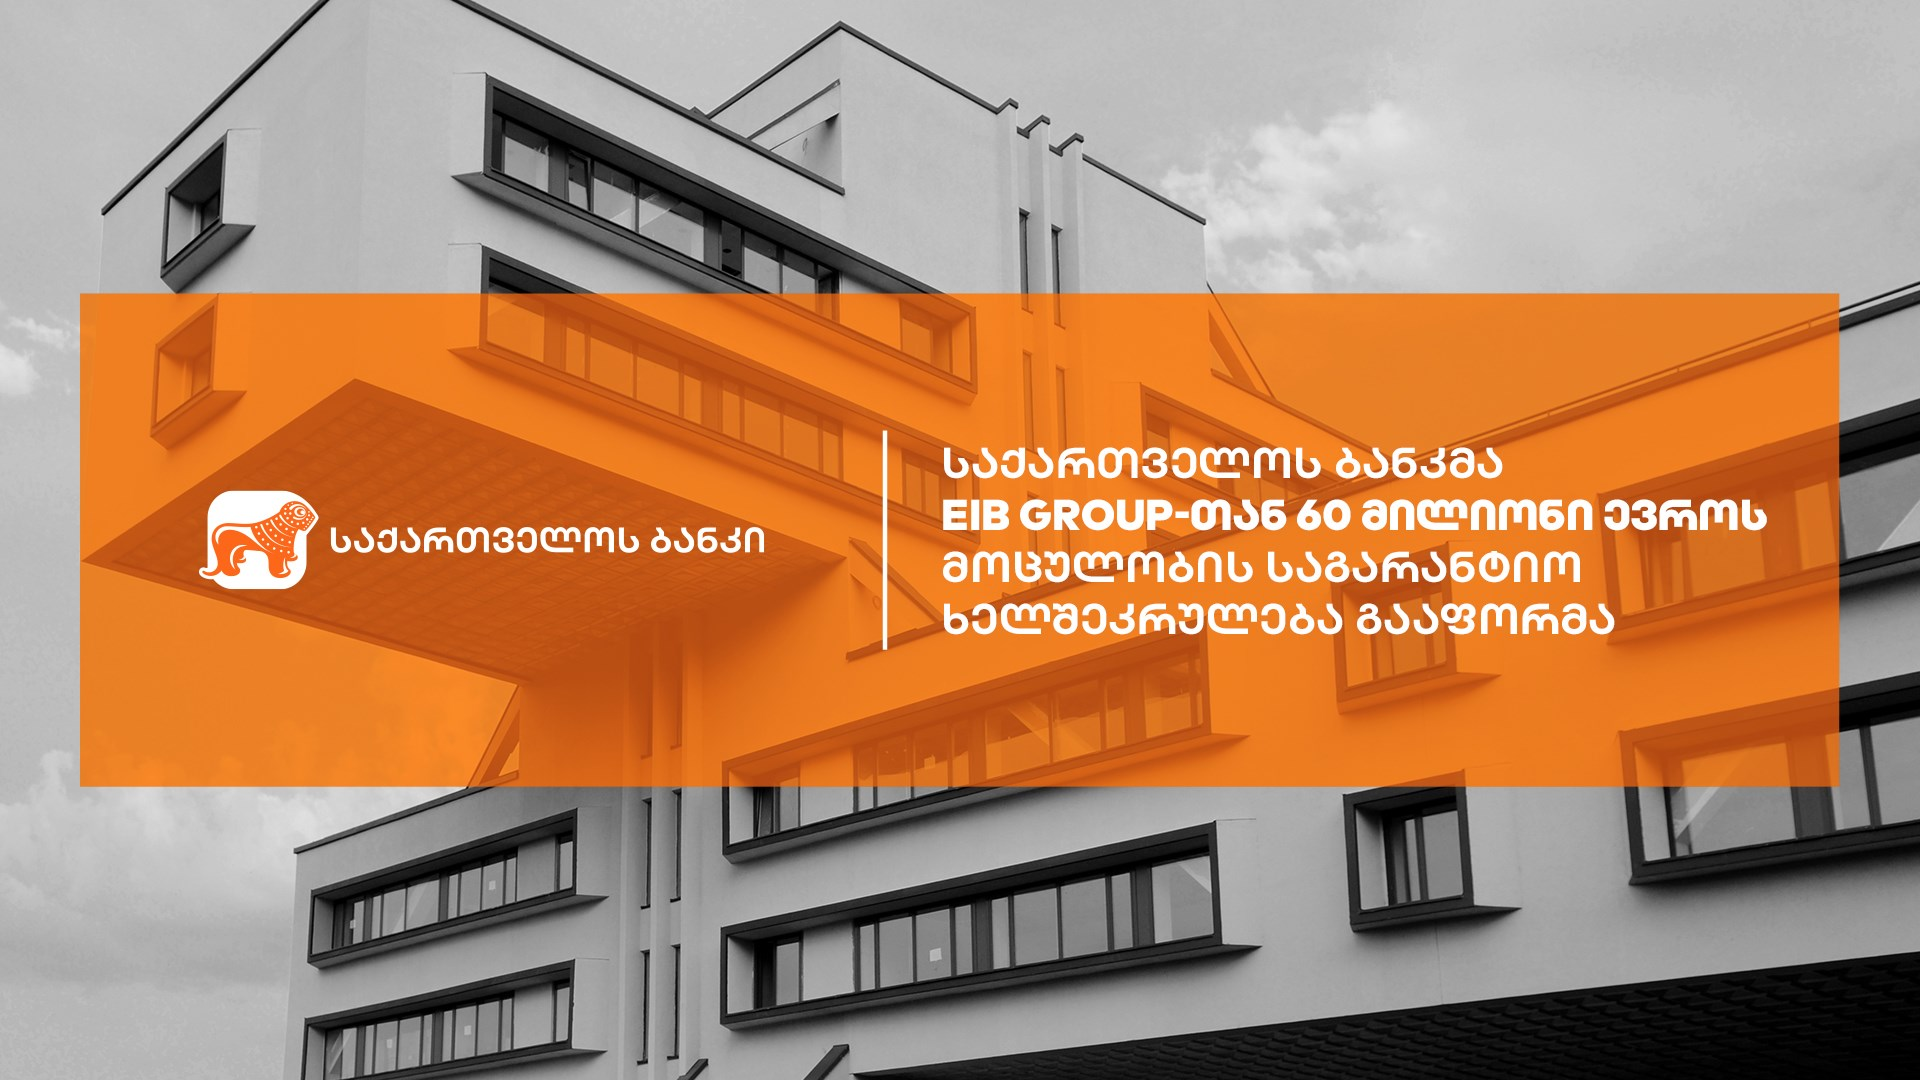 Photo of საქართველოს ბანკმა მცირე და საშუალო ბიზნესის მხარდაჭერისთვის ევროპის საინვესტიციო ბანკის ჯგუფთან 60 მილიონი ევროს მოცულობის საგარანტიო ხელშეკრულება გააფორმა